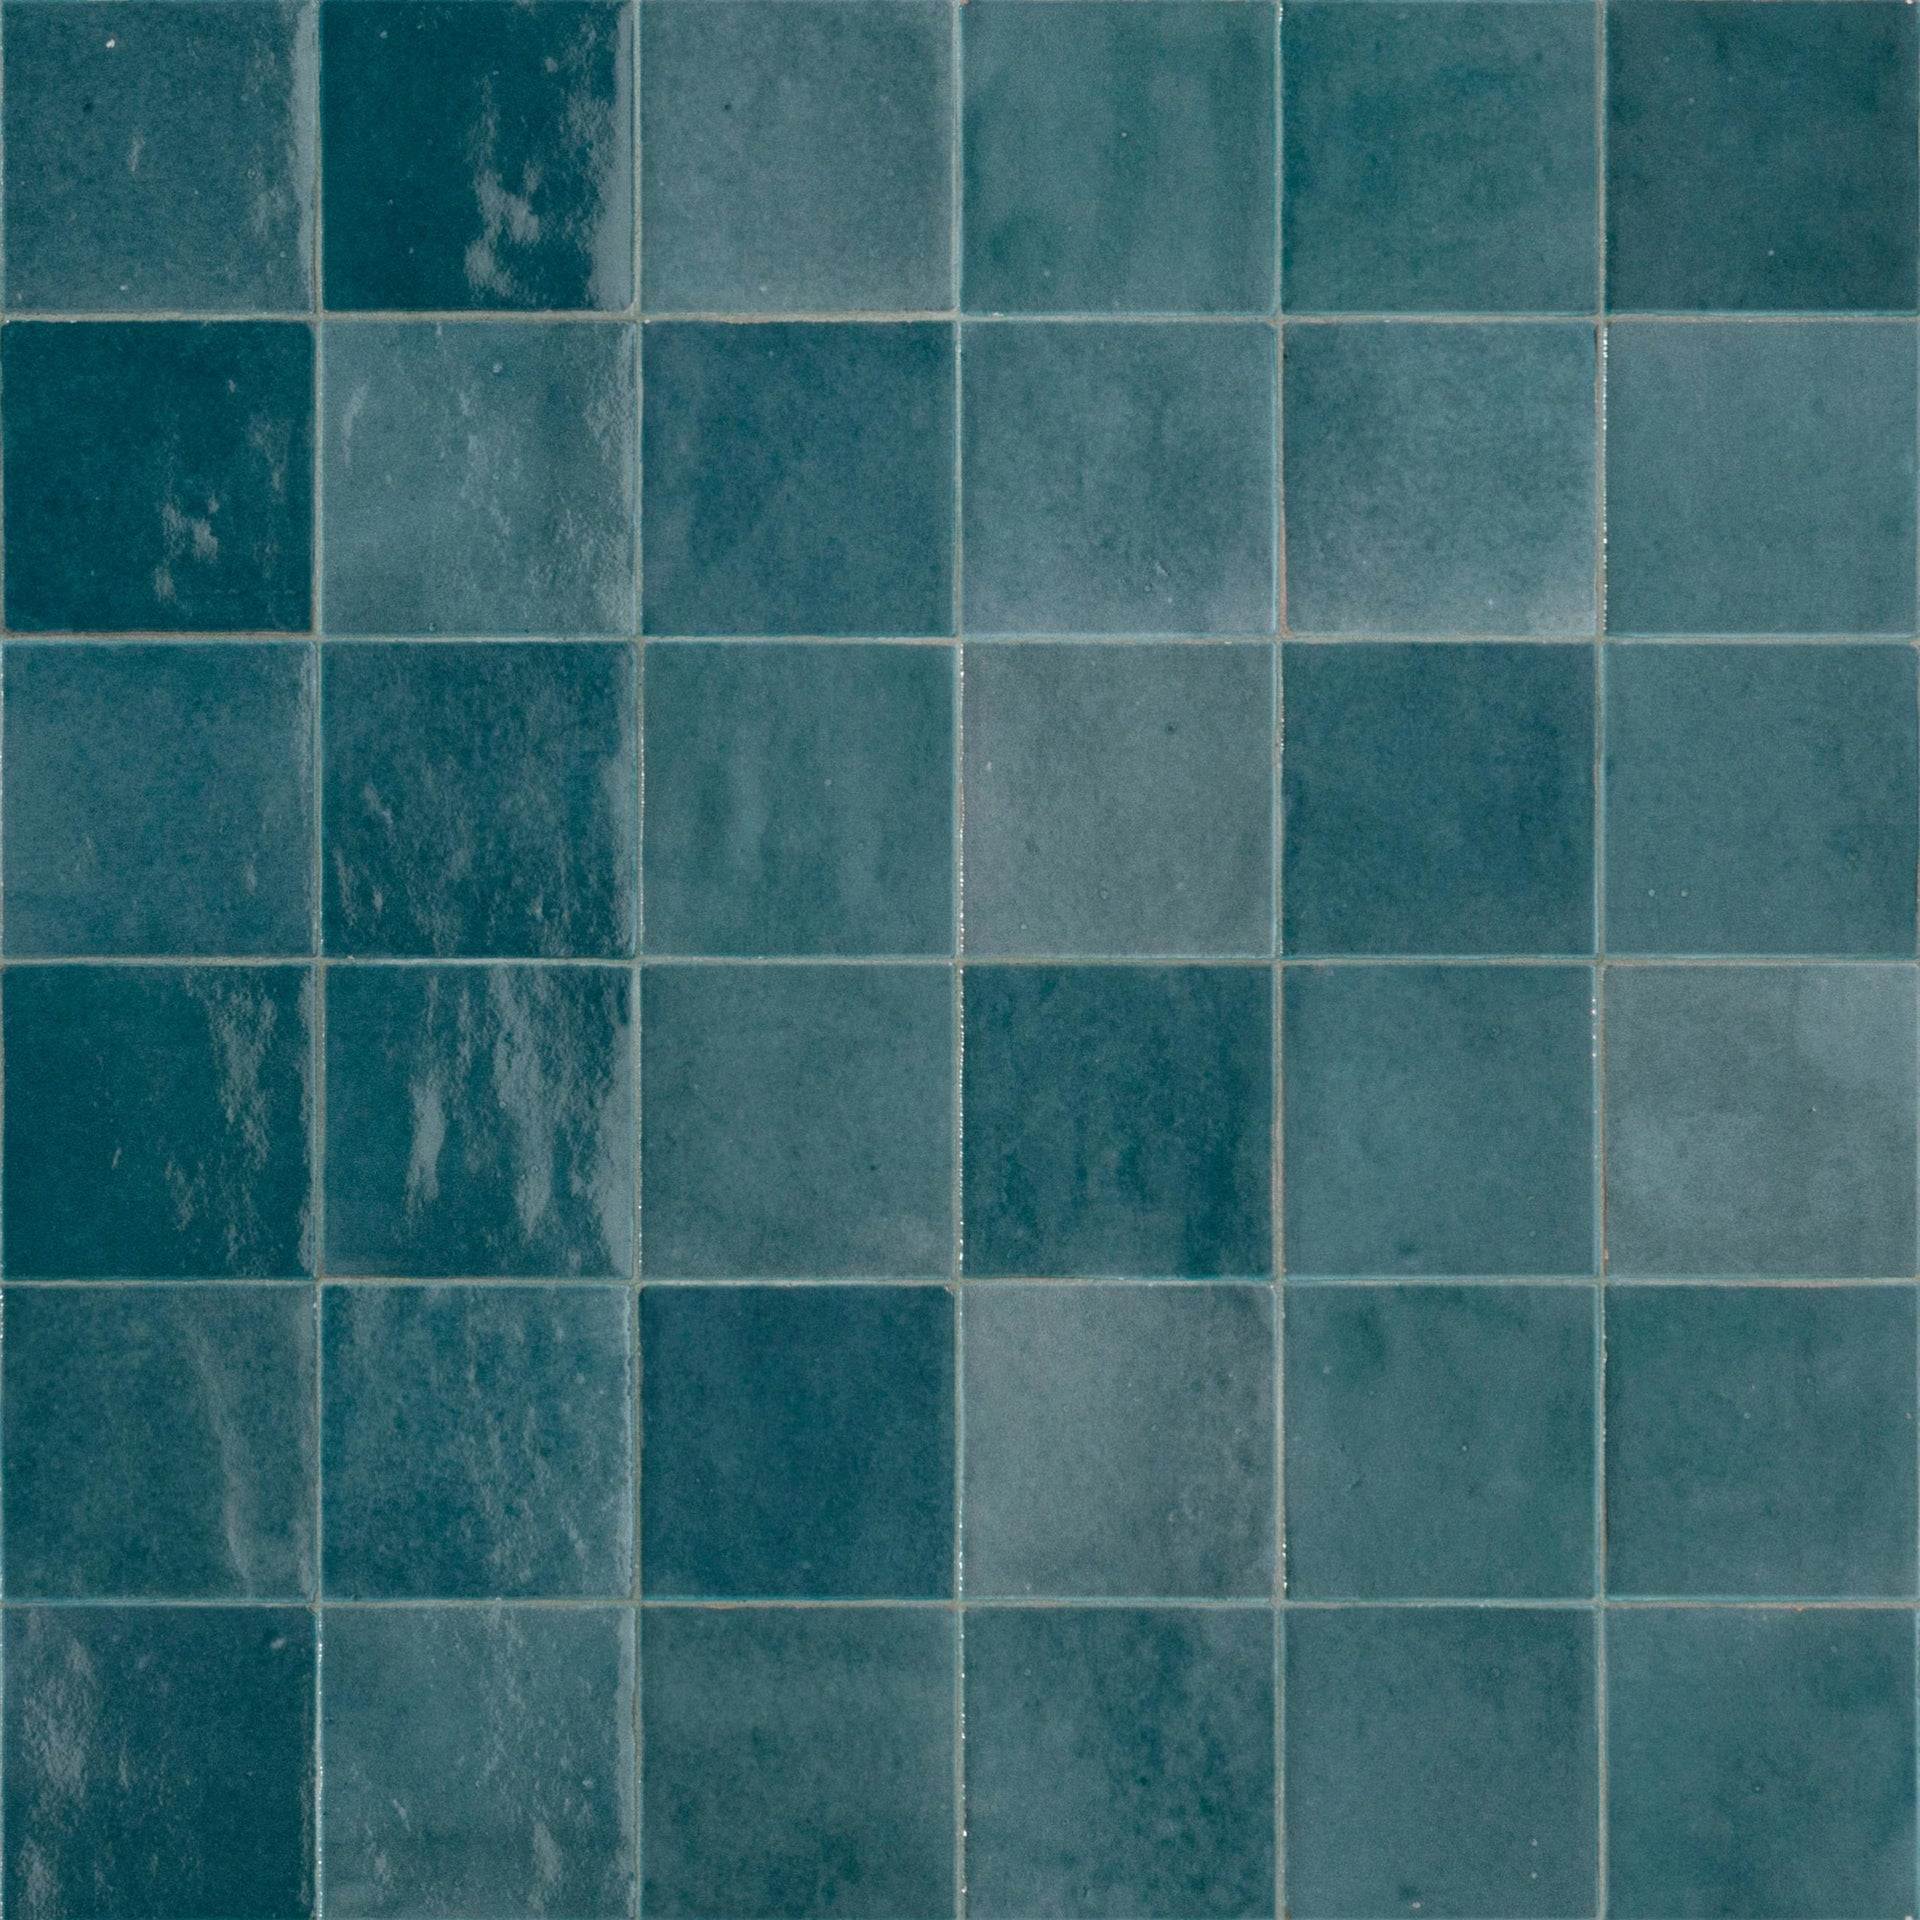 Piastrella per rivestimenti Zelli 10 x 10 cm sp. 10 mm blu - 2